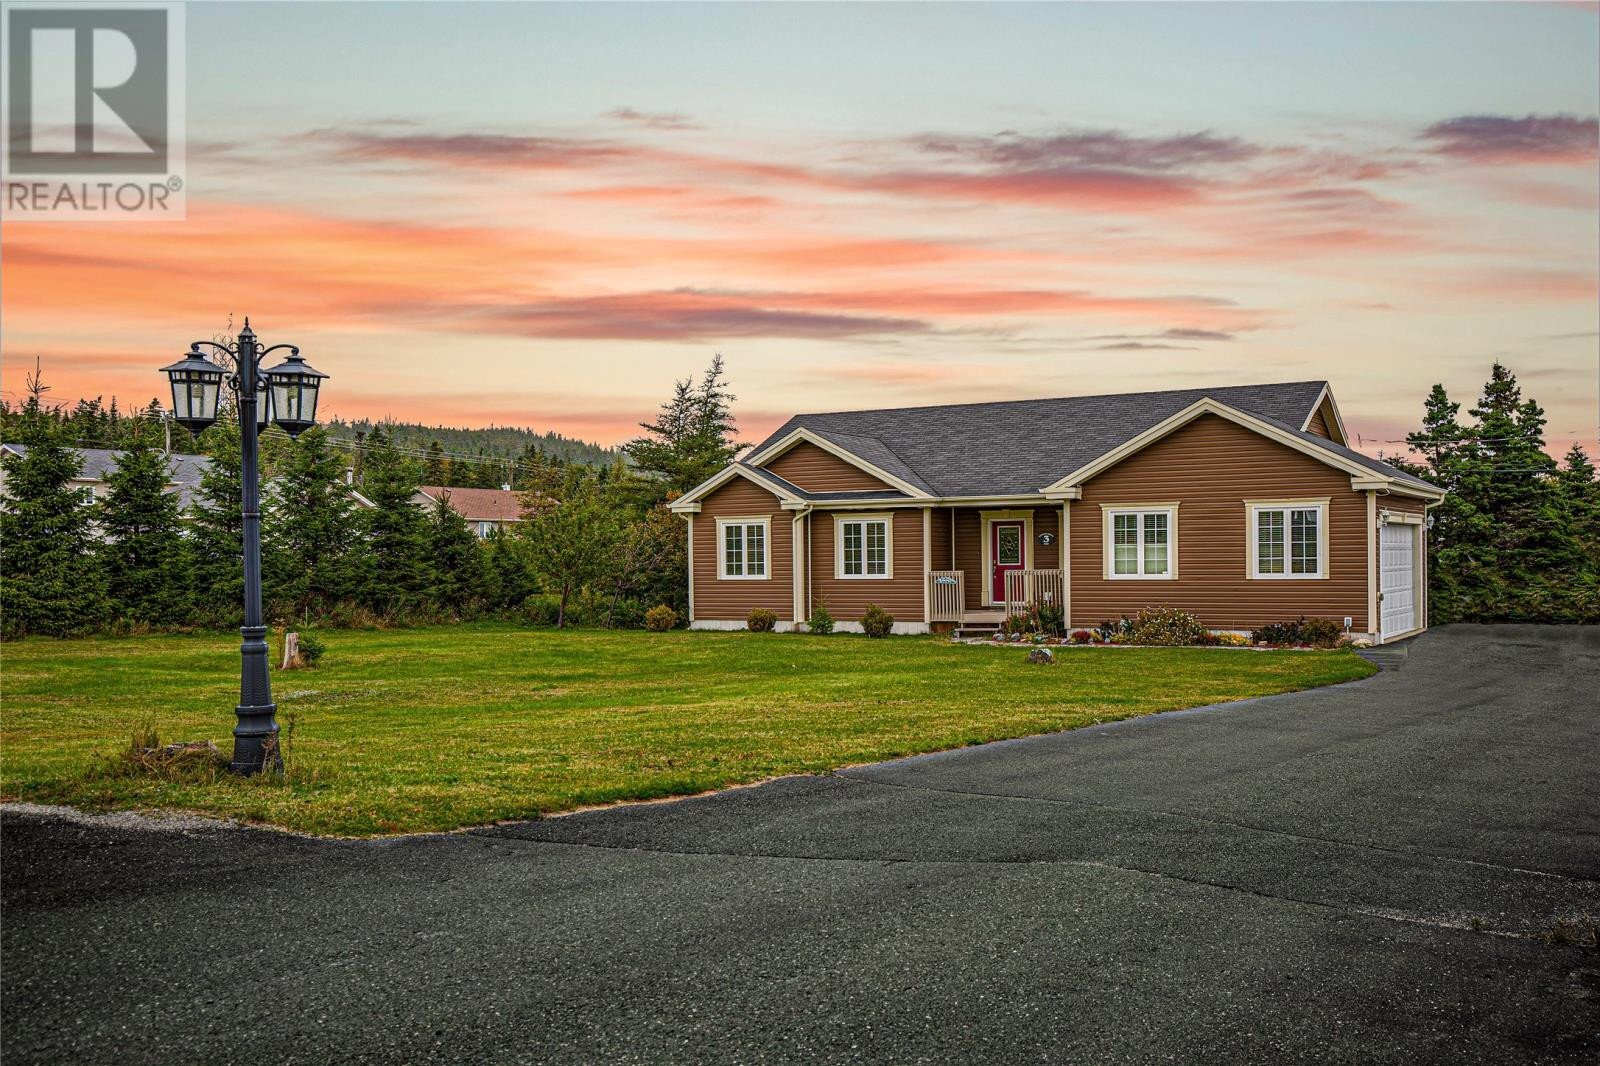 House for sale at 3 Rattling Brook Rd Torbay Newfoundland - MLS: 1224415